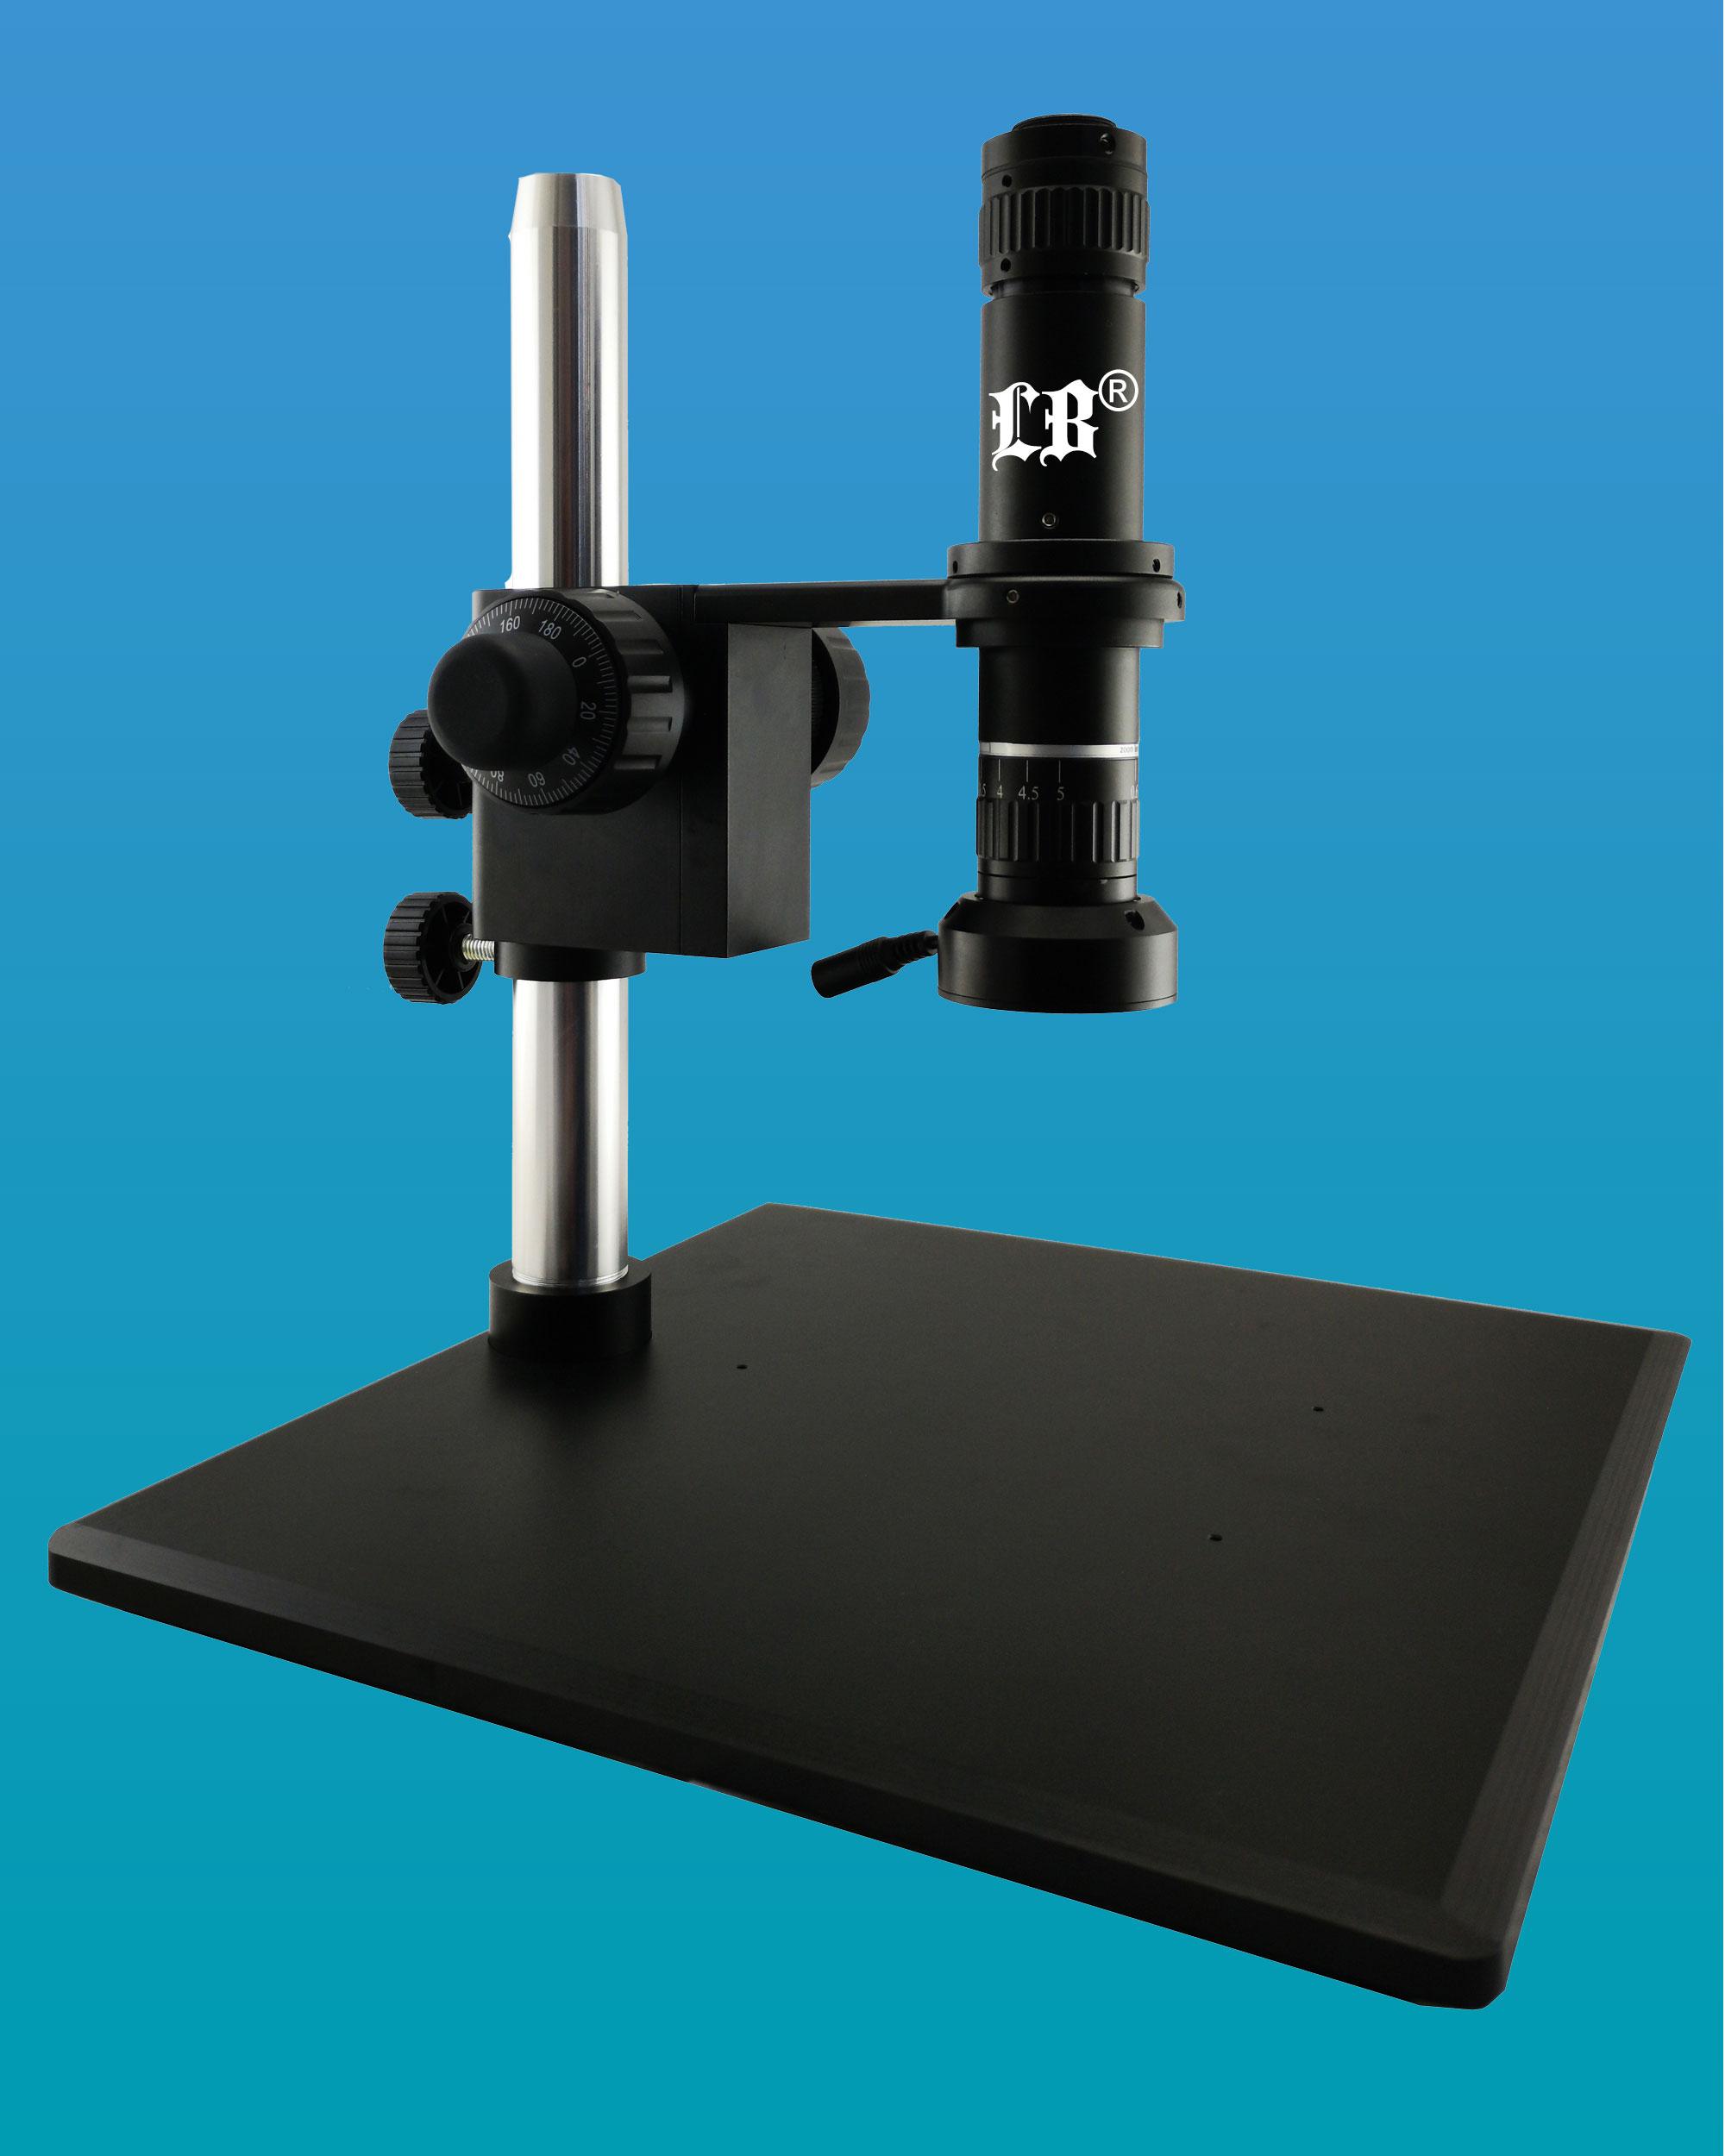 [LB-108] Monocular Zoom Microscope